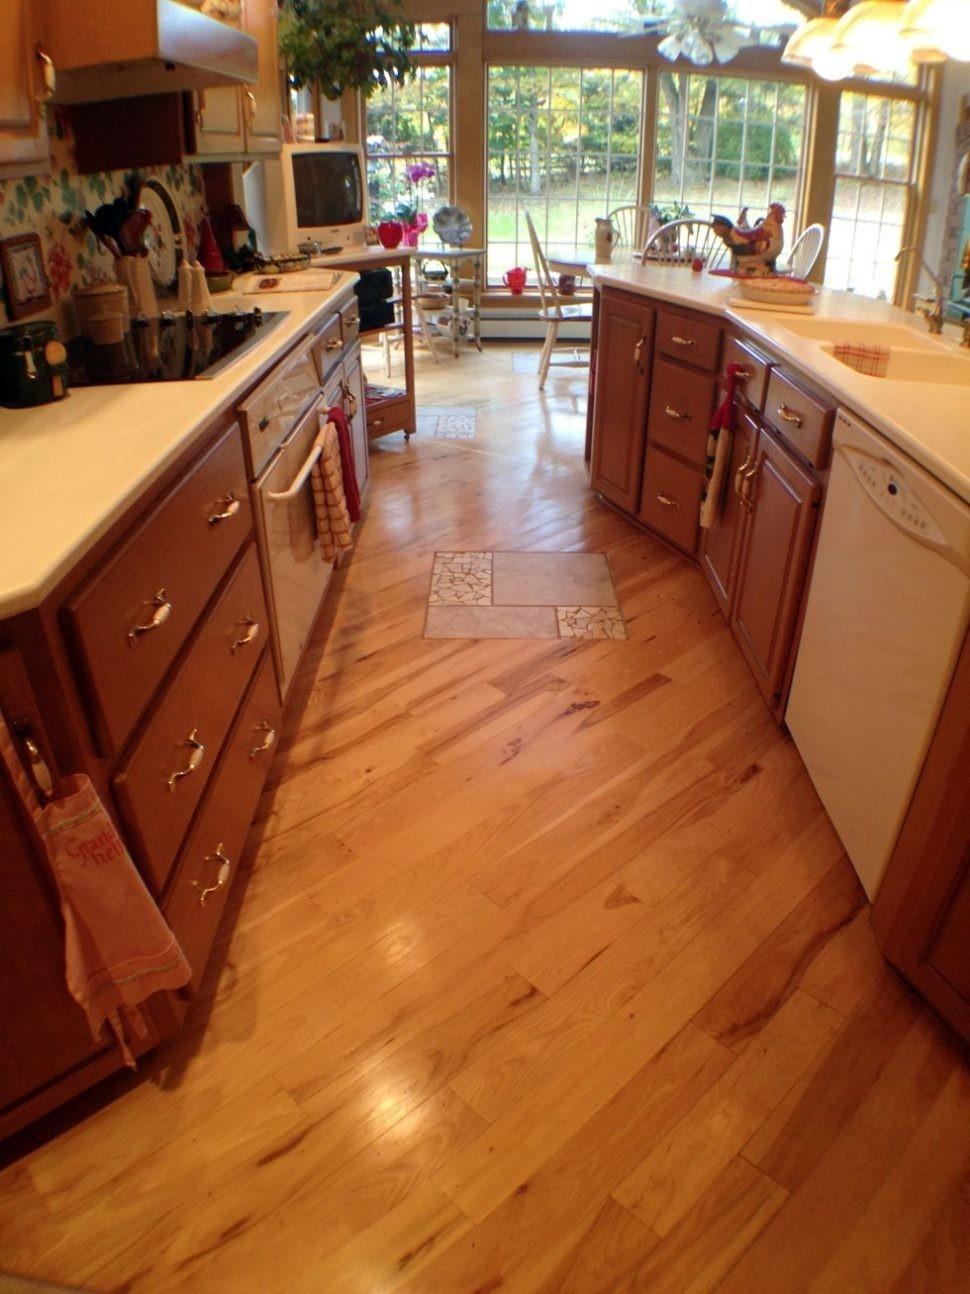 hardwood floor refinishing orange county of 17 new cost of hardwood floor installation pics dizpos com intended for 16 lovely s hardwood floor installation cost